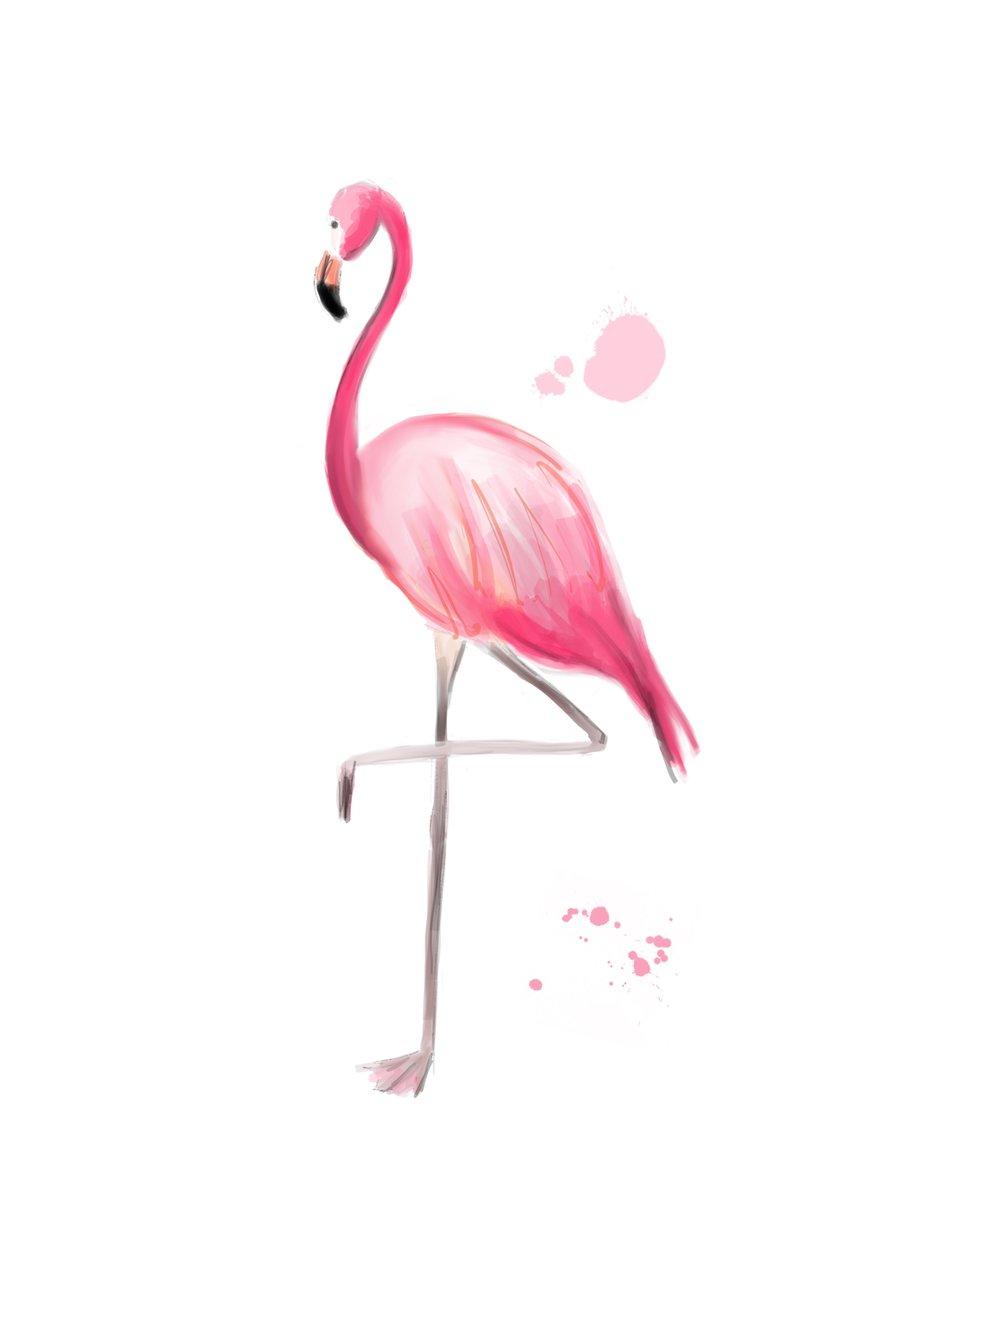 Flamingo01.jpg